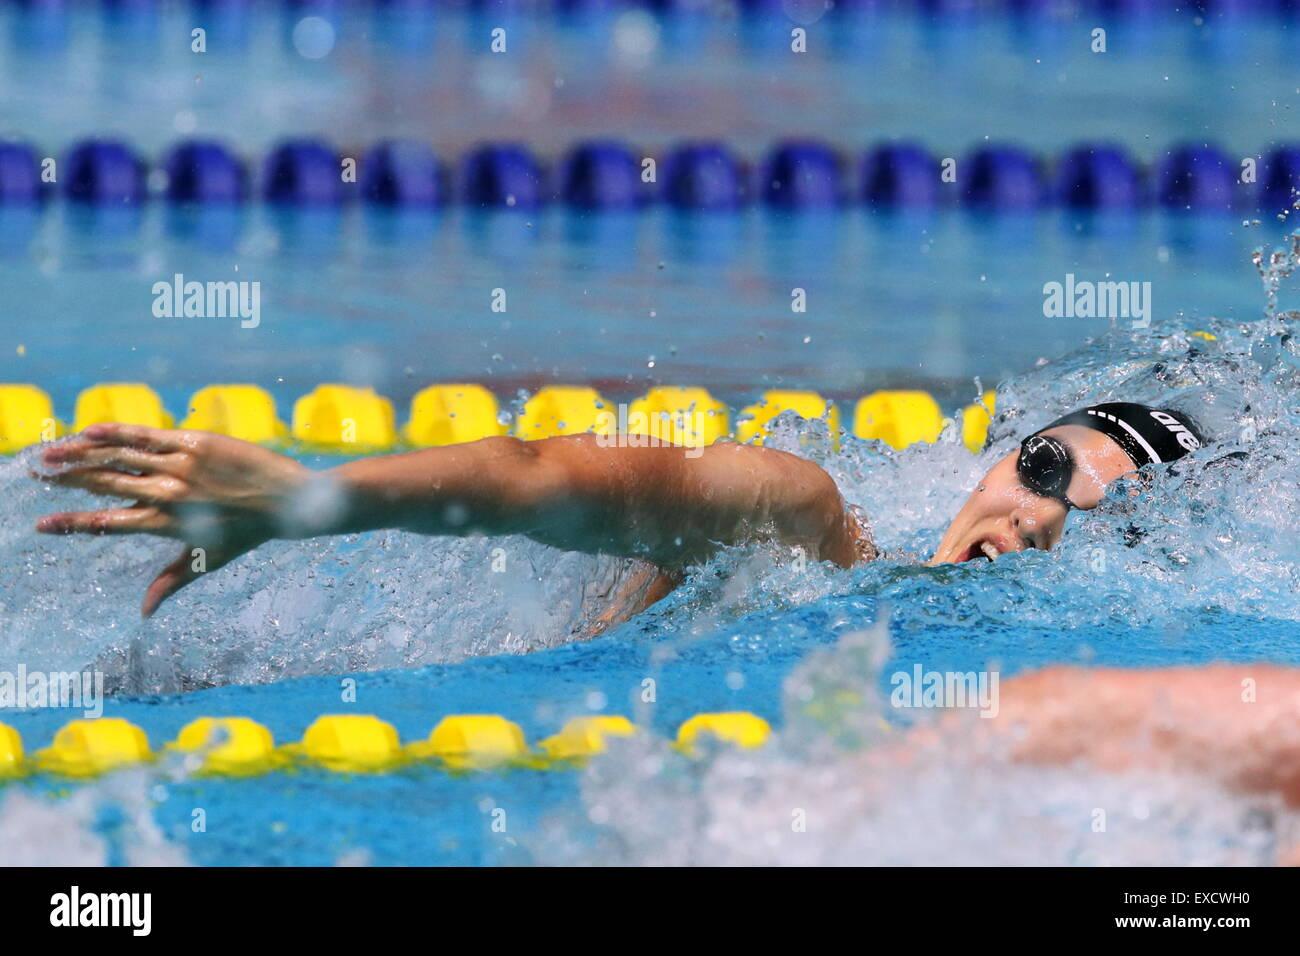 Gwangju, Corea del Sud. 10 Luglio, 2015. Yui Yamane (JPN) Nuoto : La xxviii Universiade estiva 2015 Gwangju Donne Immagini Stock